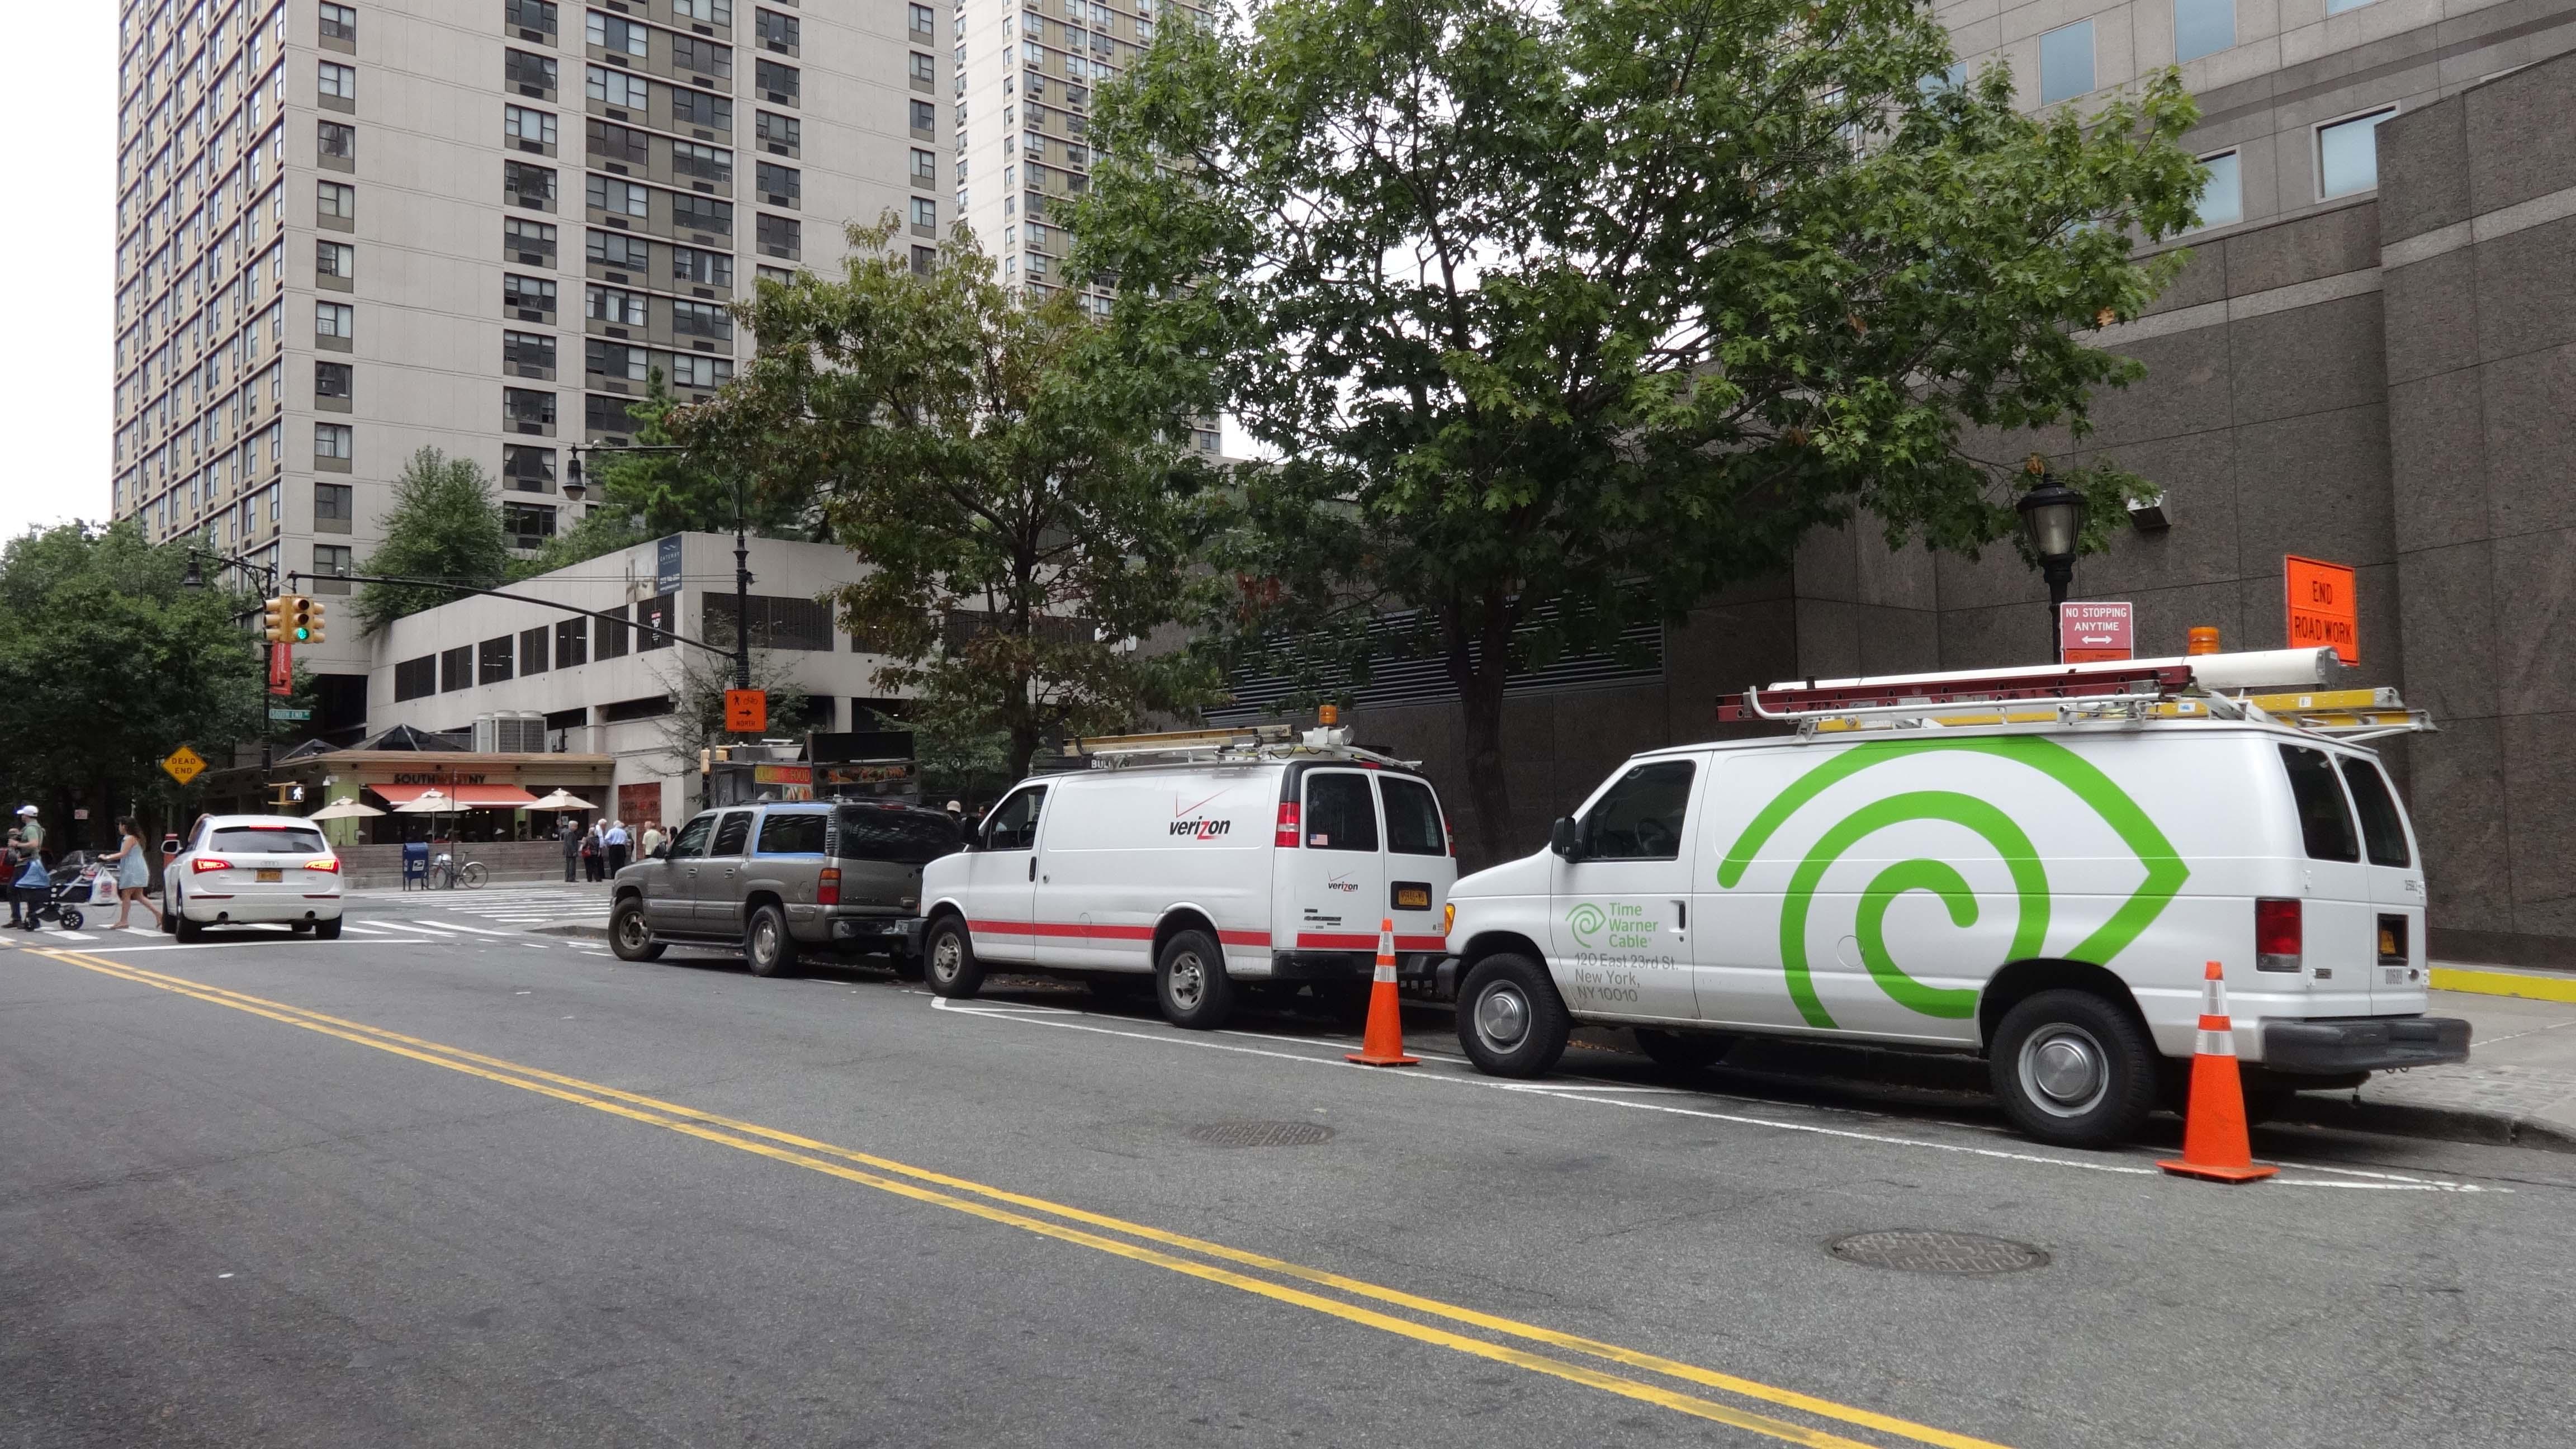 doughnut cart on Albany blocking bike path with SUV